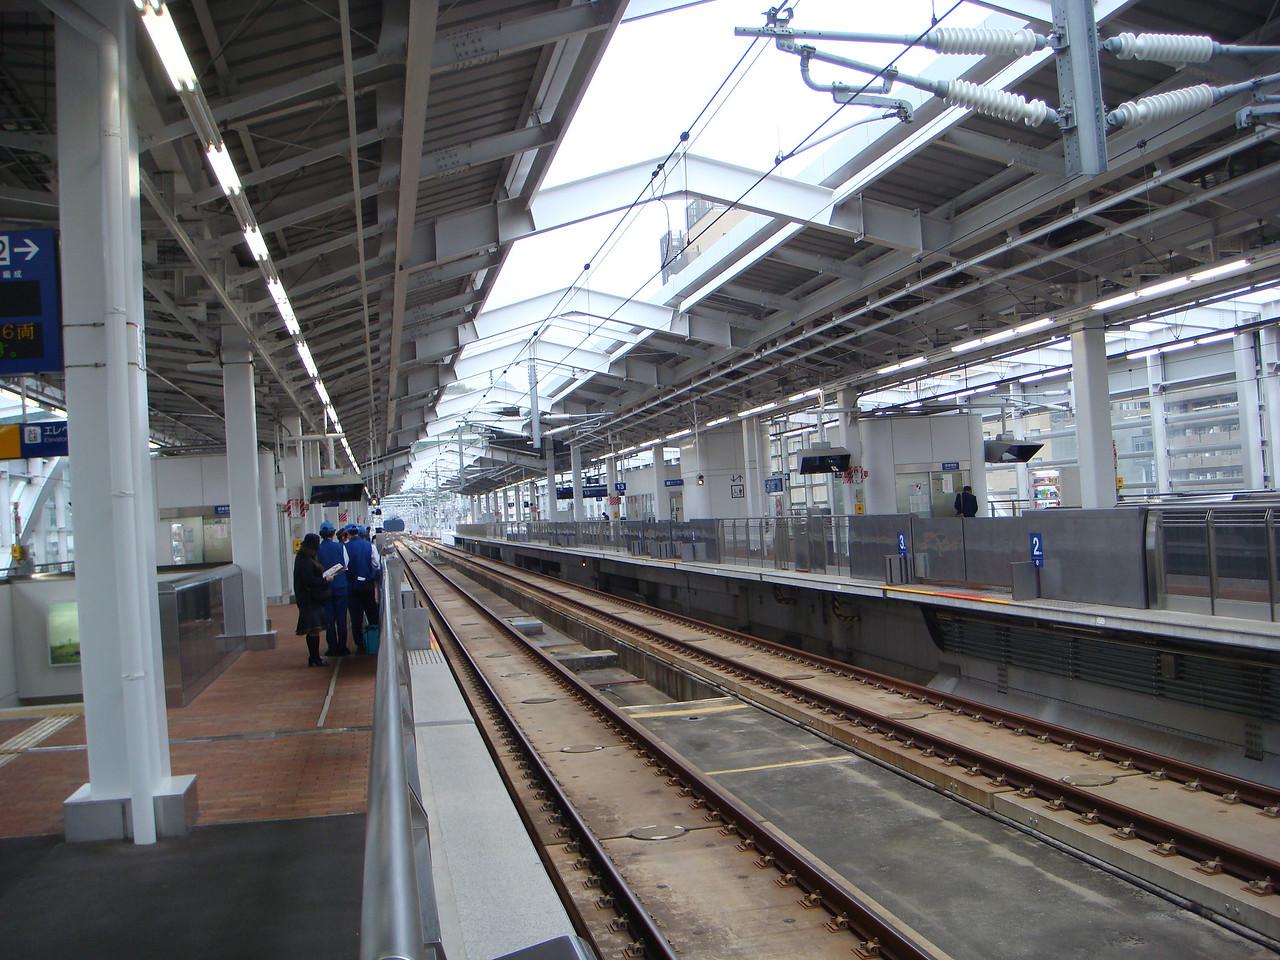 Waiting on the bullet train at train station in Kagoshima, Japan